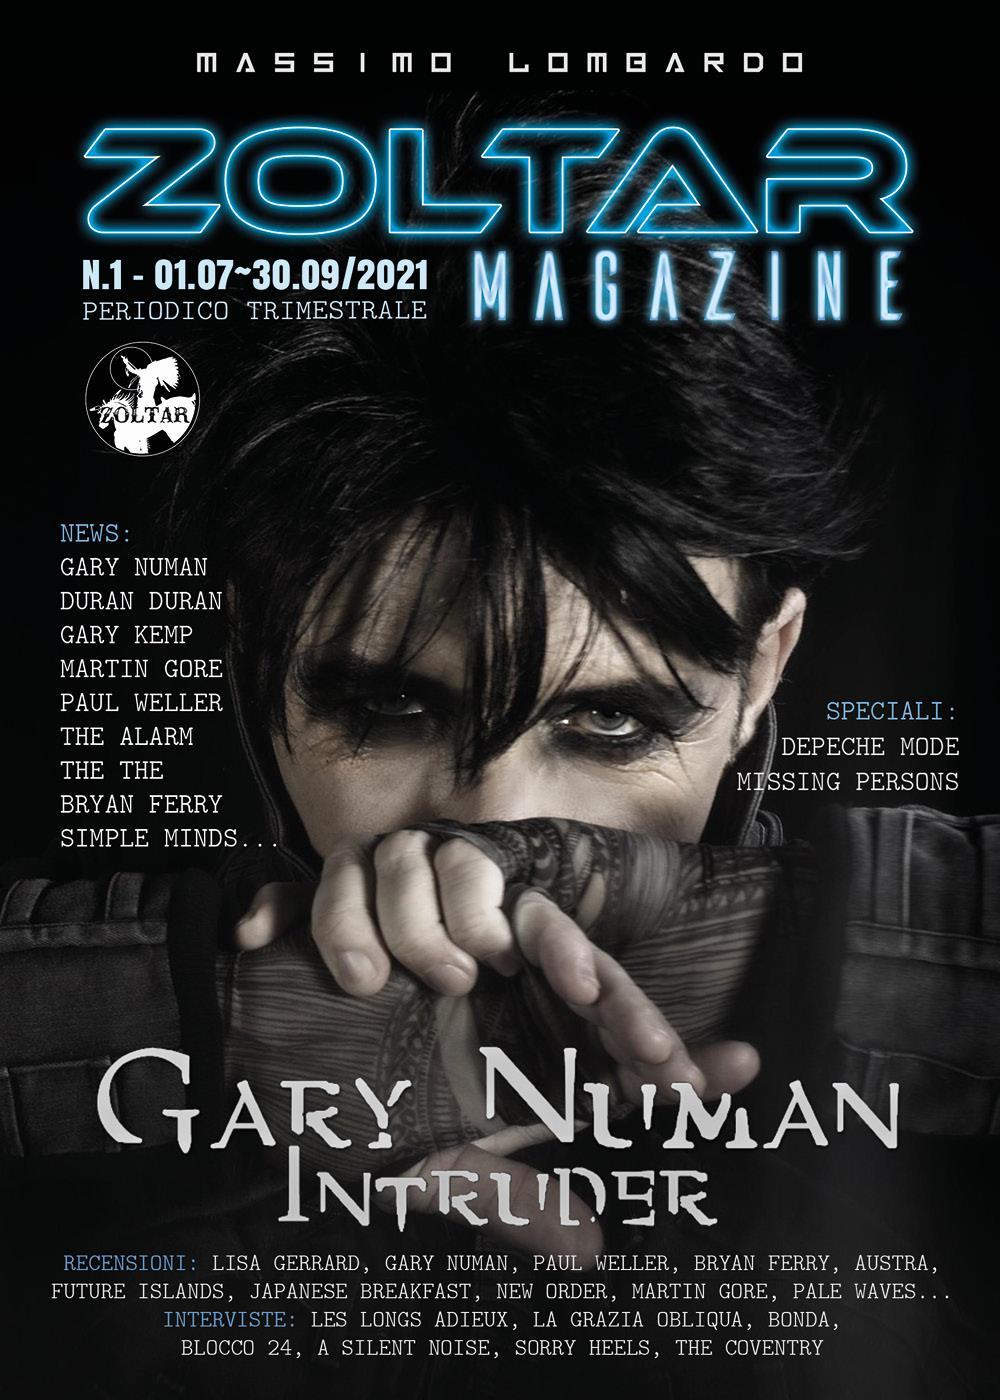 Zoltar Magazine N.1